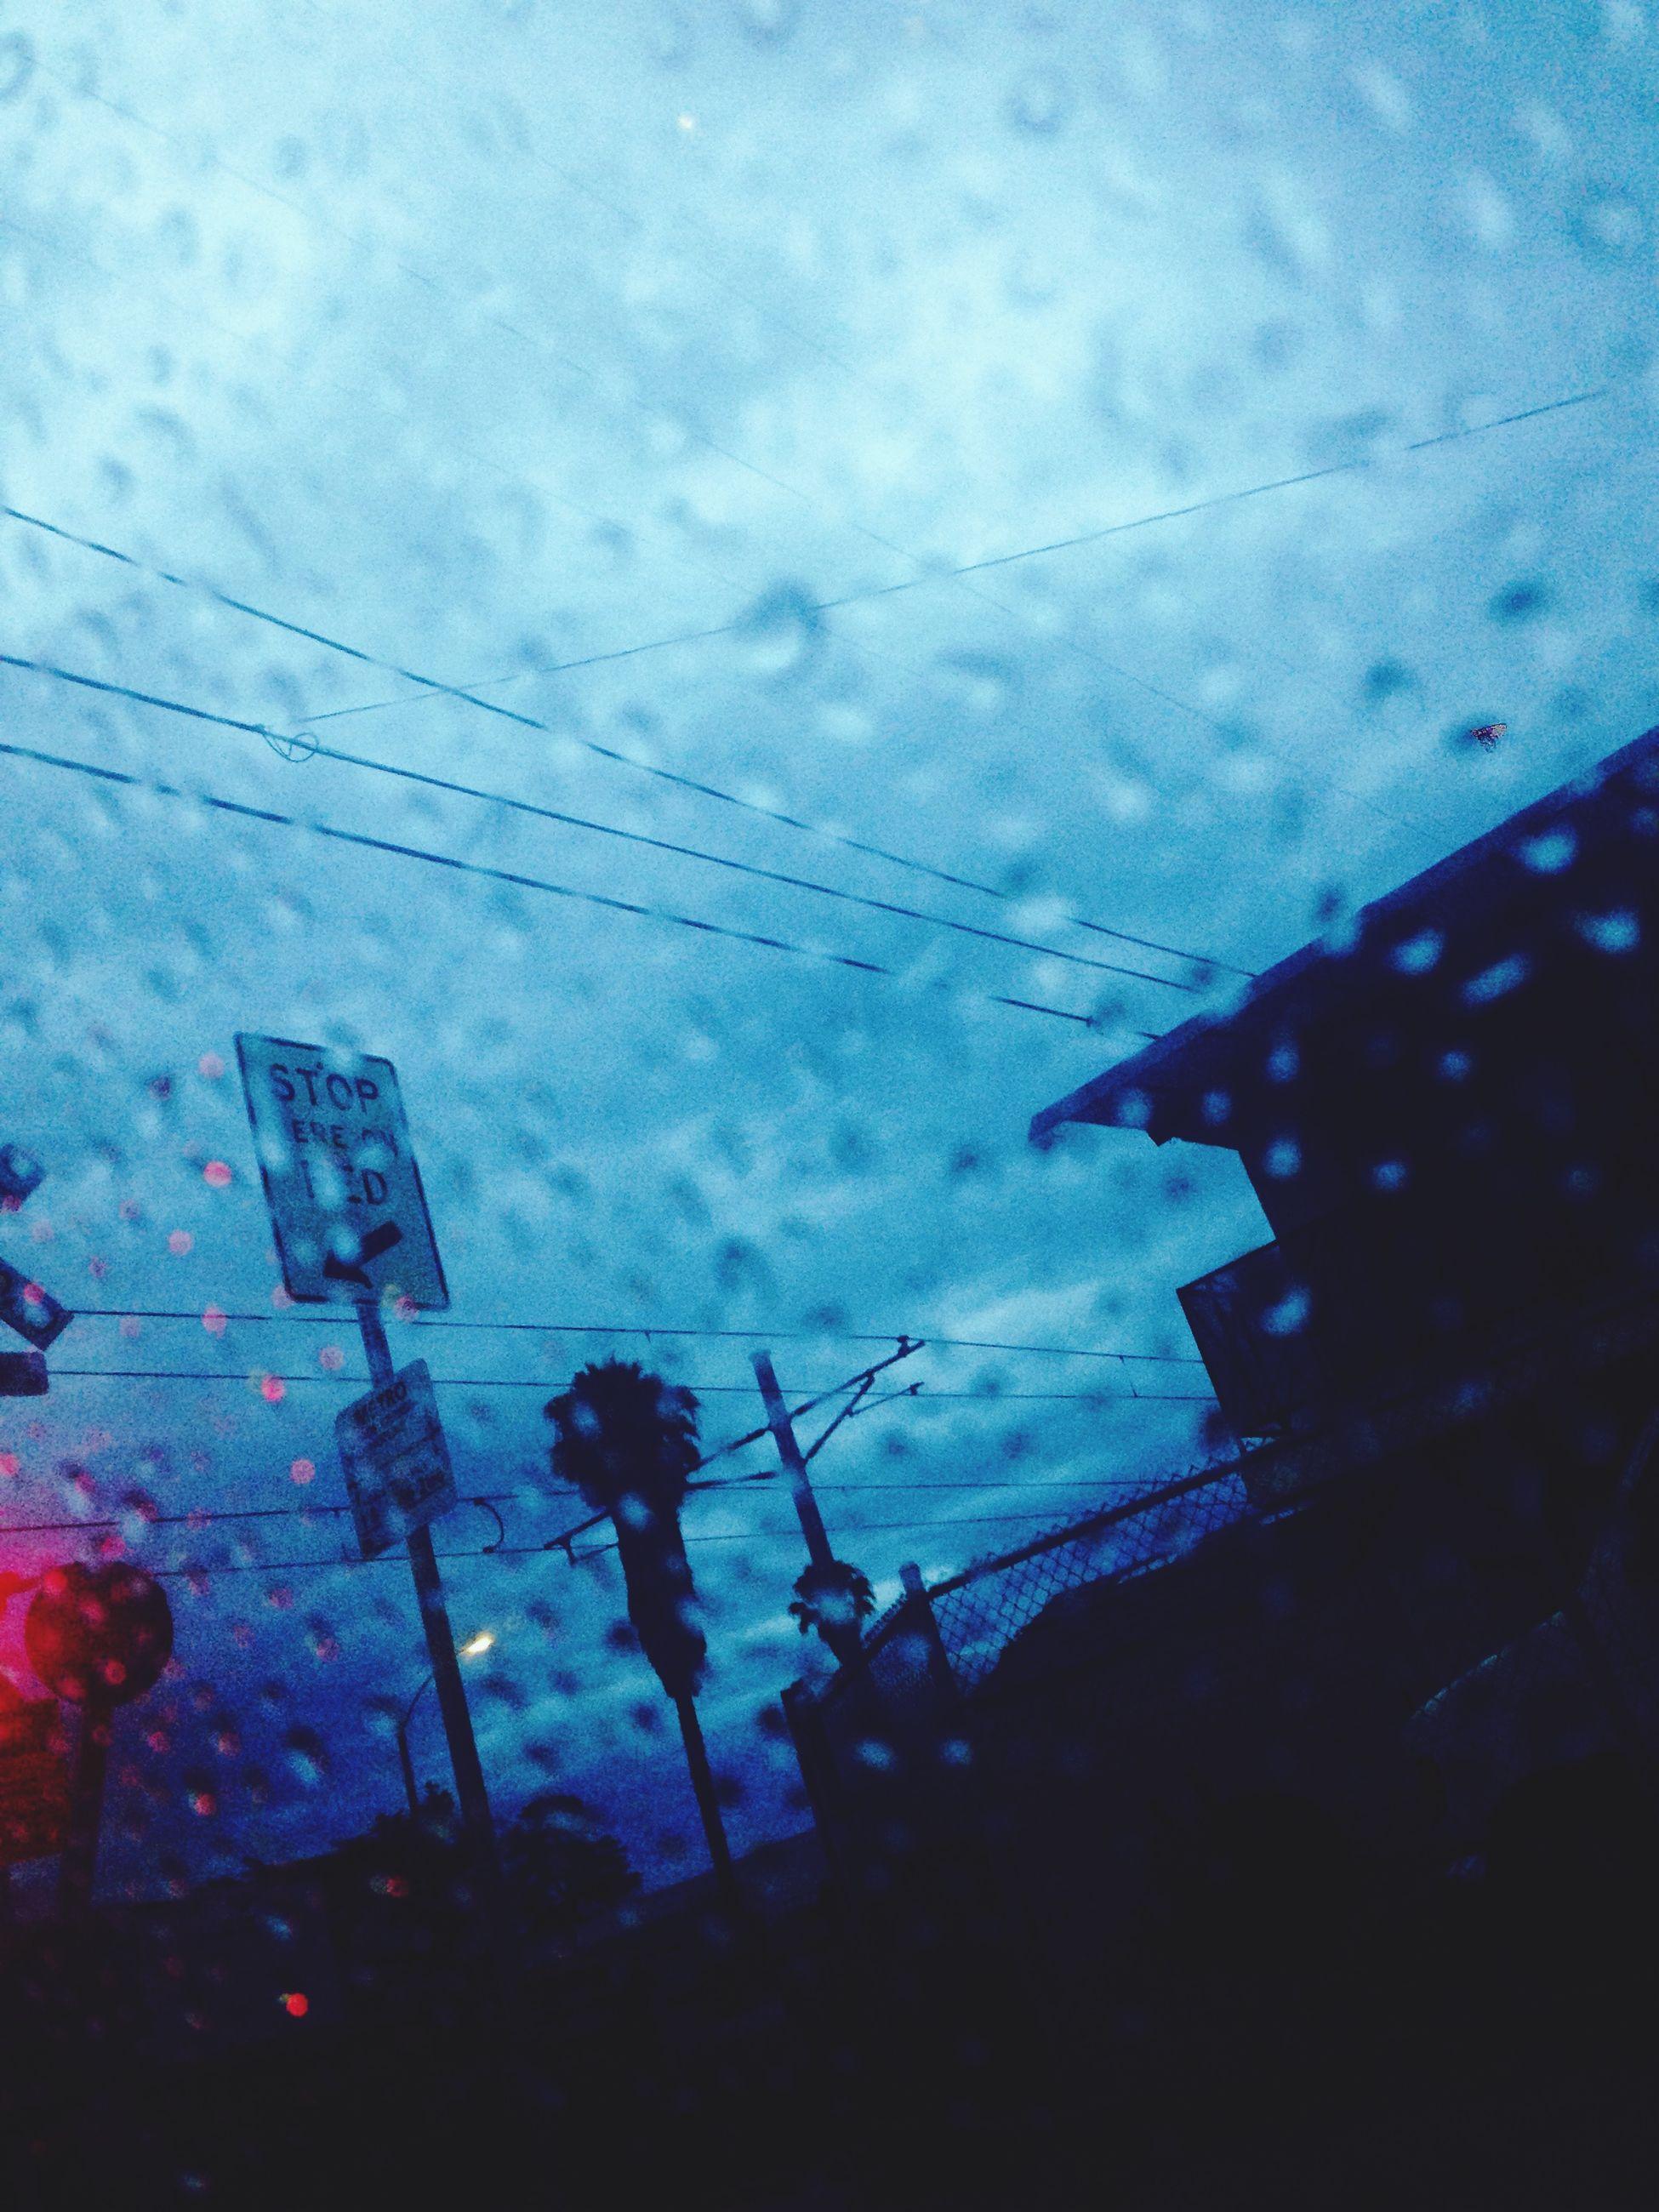 weather, sky, season, rain, wet, silhouette, building exterior, street, window, dusk, built structure, architecture, cloud - sky, car, glass - material, transparent, road, transportation, drop, power line